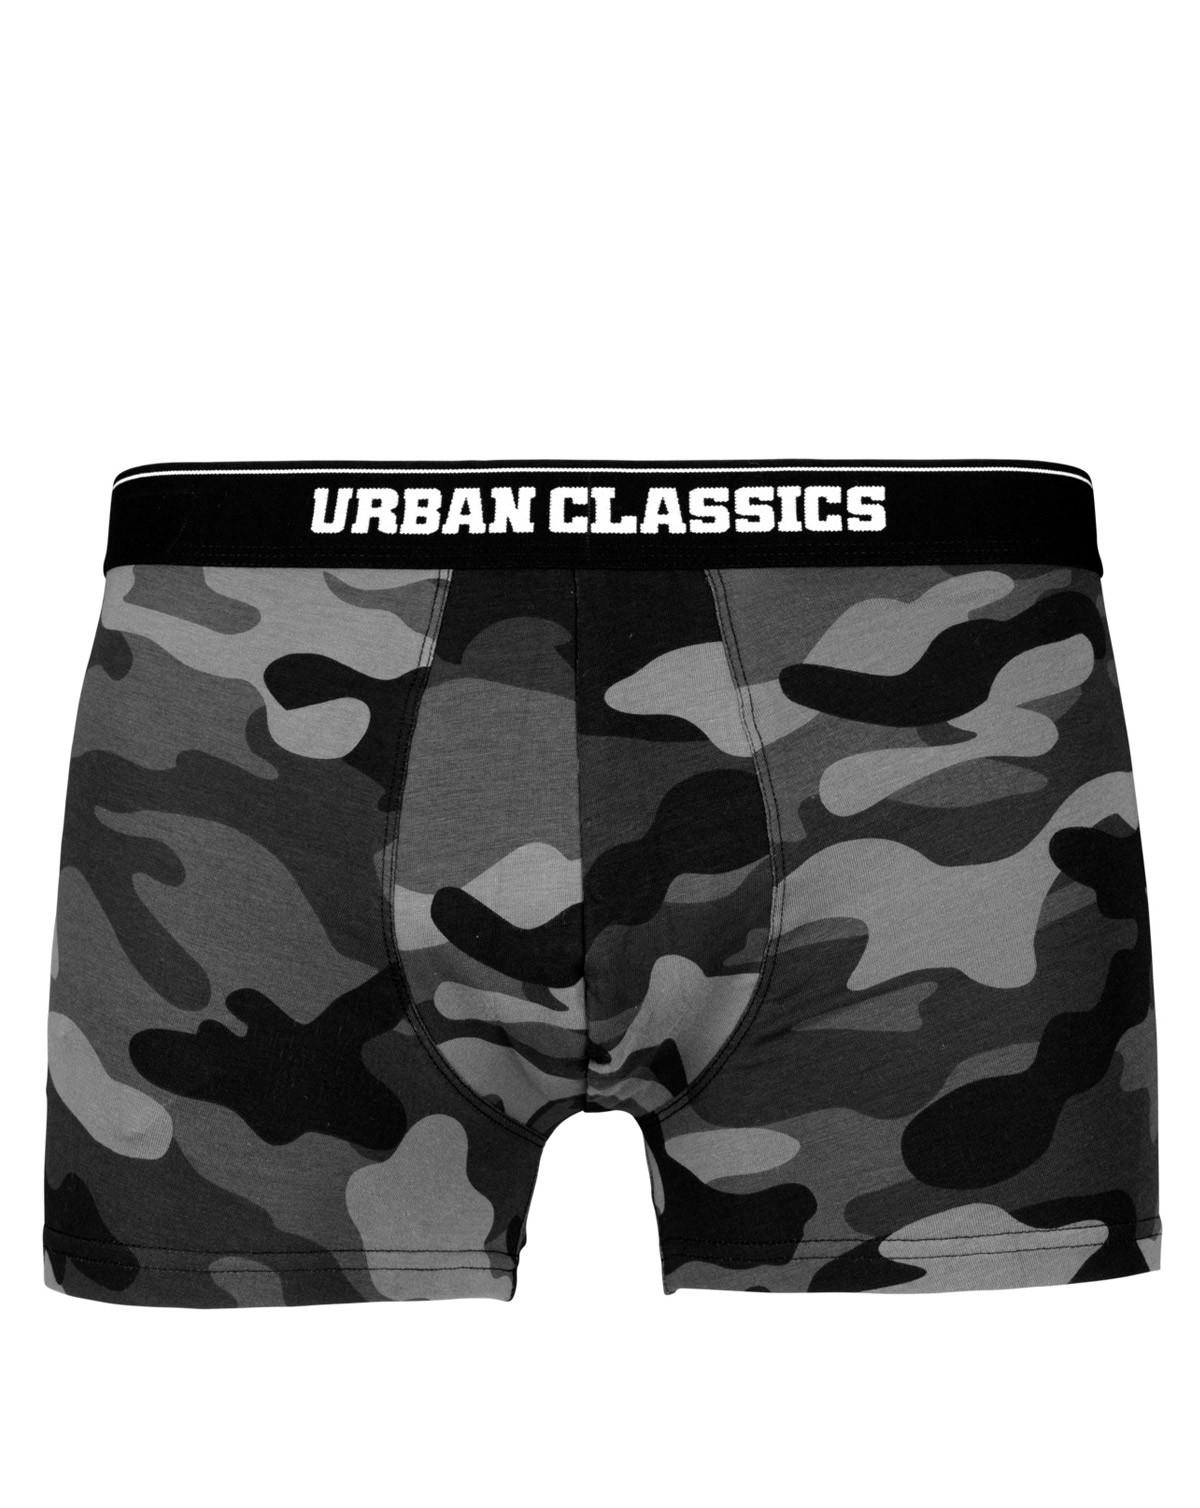 Image of   Urban Classics Camouflage Boxer Shorts - 2-Pak (Dark Camo, 2XL)